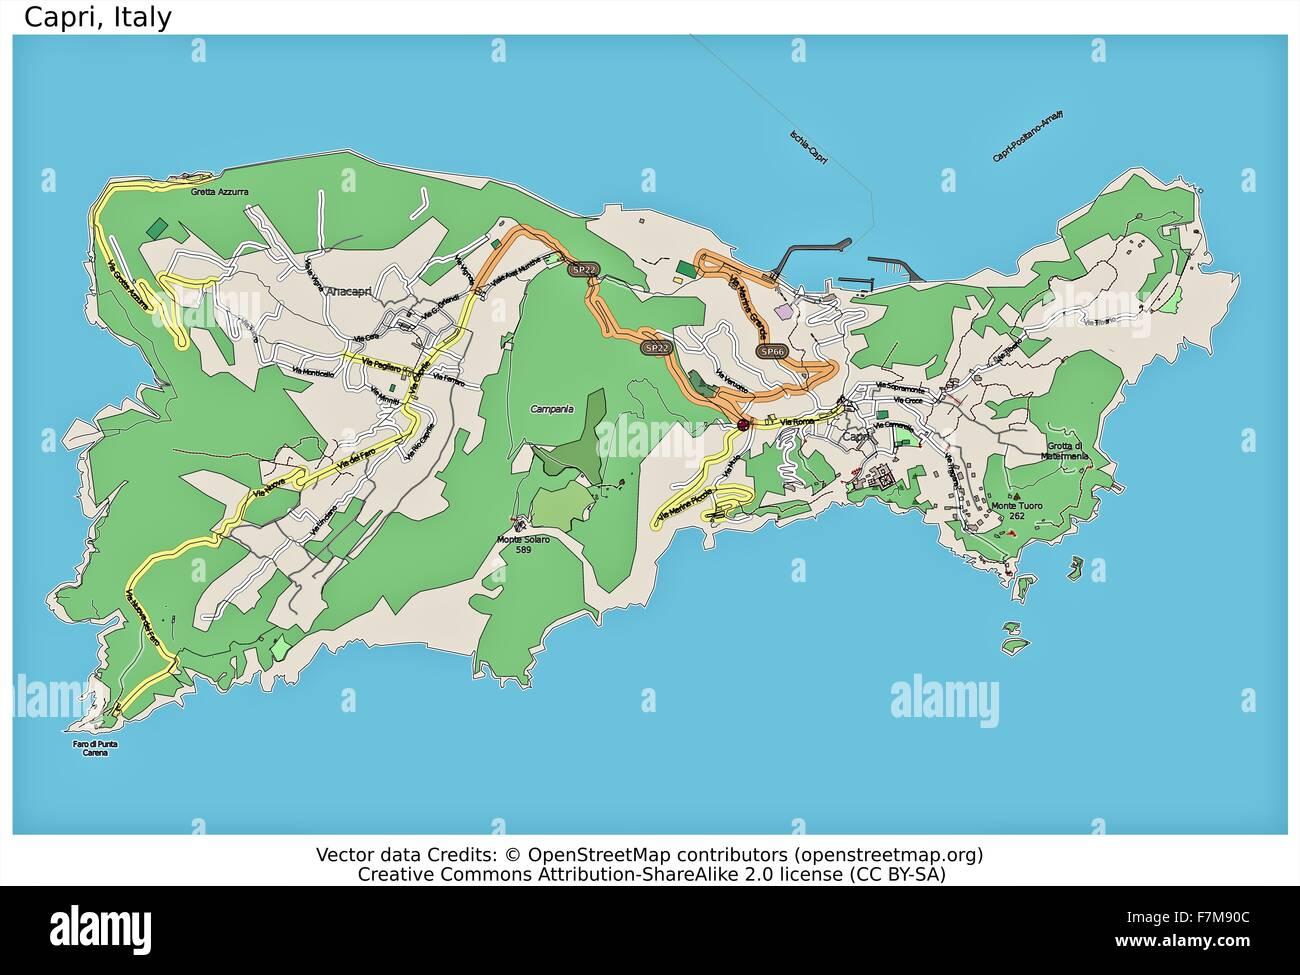 Capri Italy island city map Stock Photo 90800540 Alamy